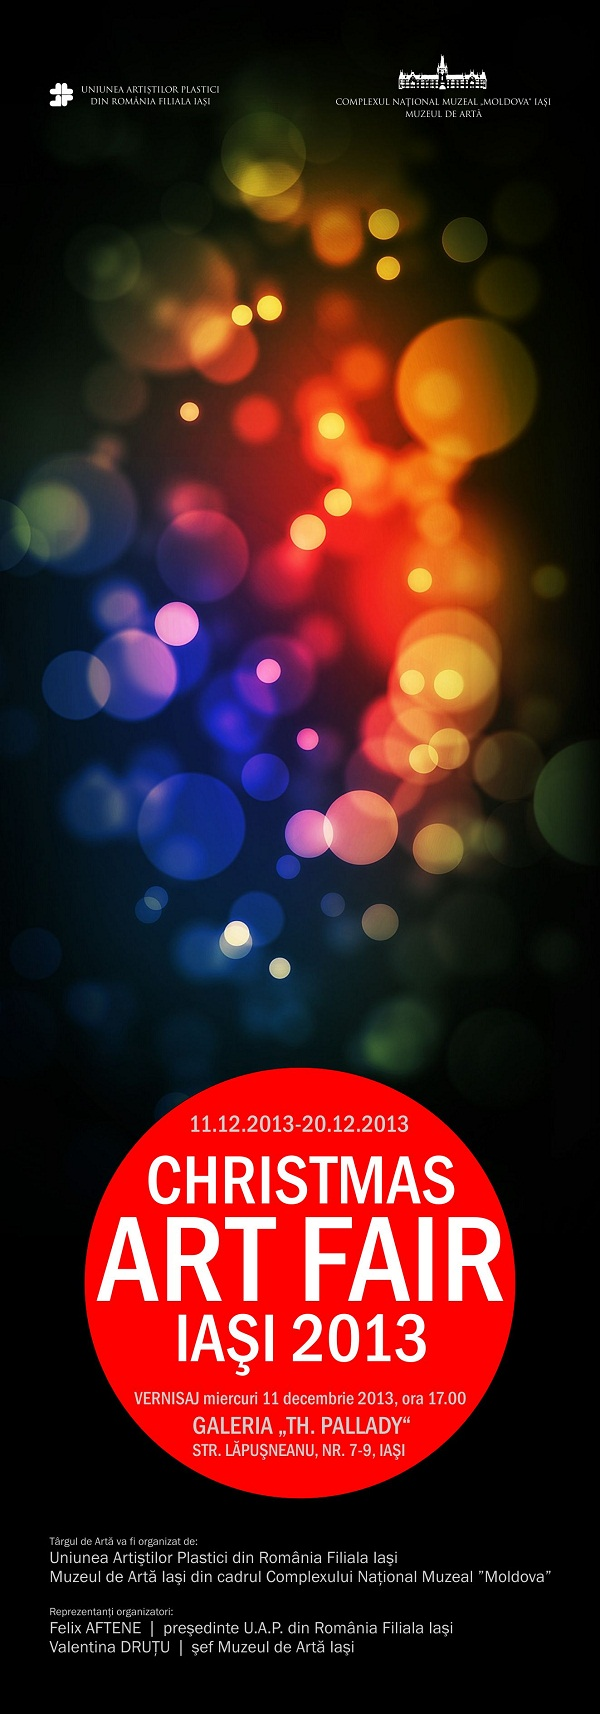 christmas-art-fair-iasi-2013-afis-targ-de-arta